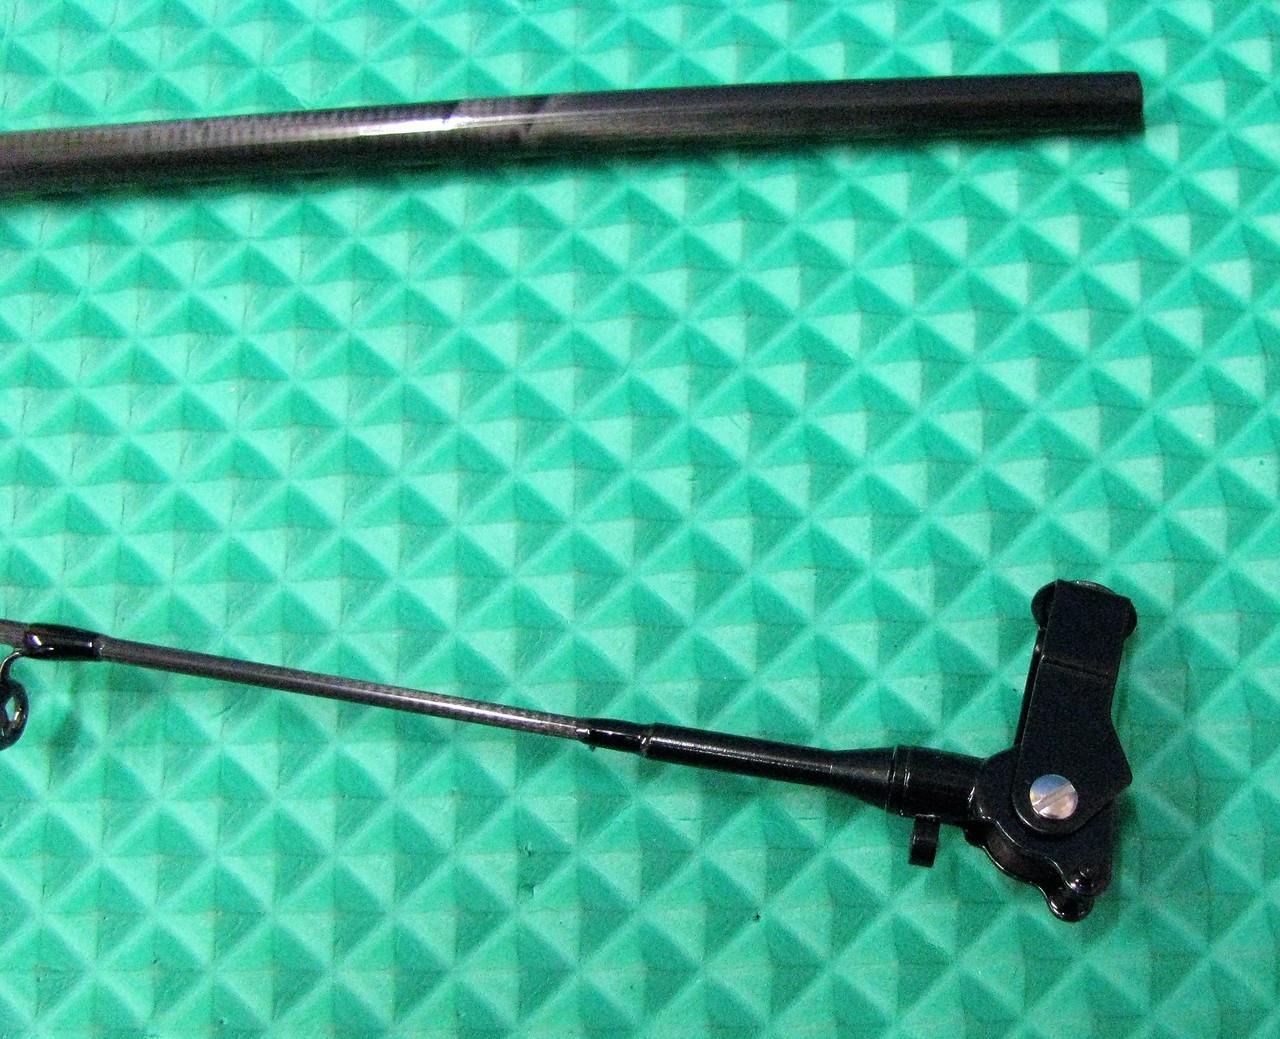 Okuma Coldwater Pro Trolling rod 8'